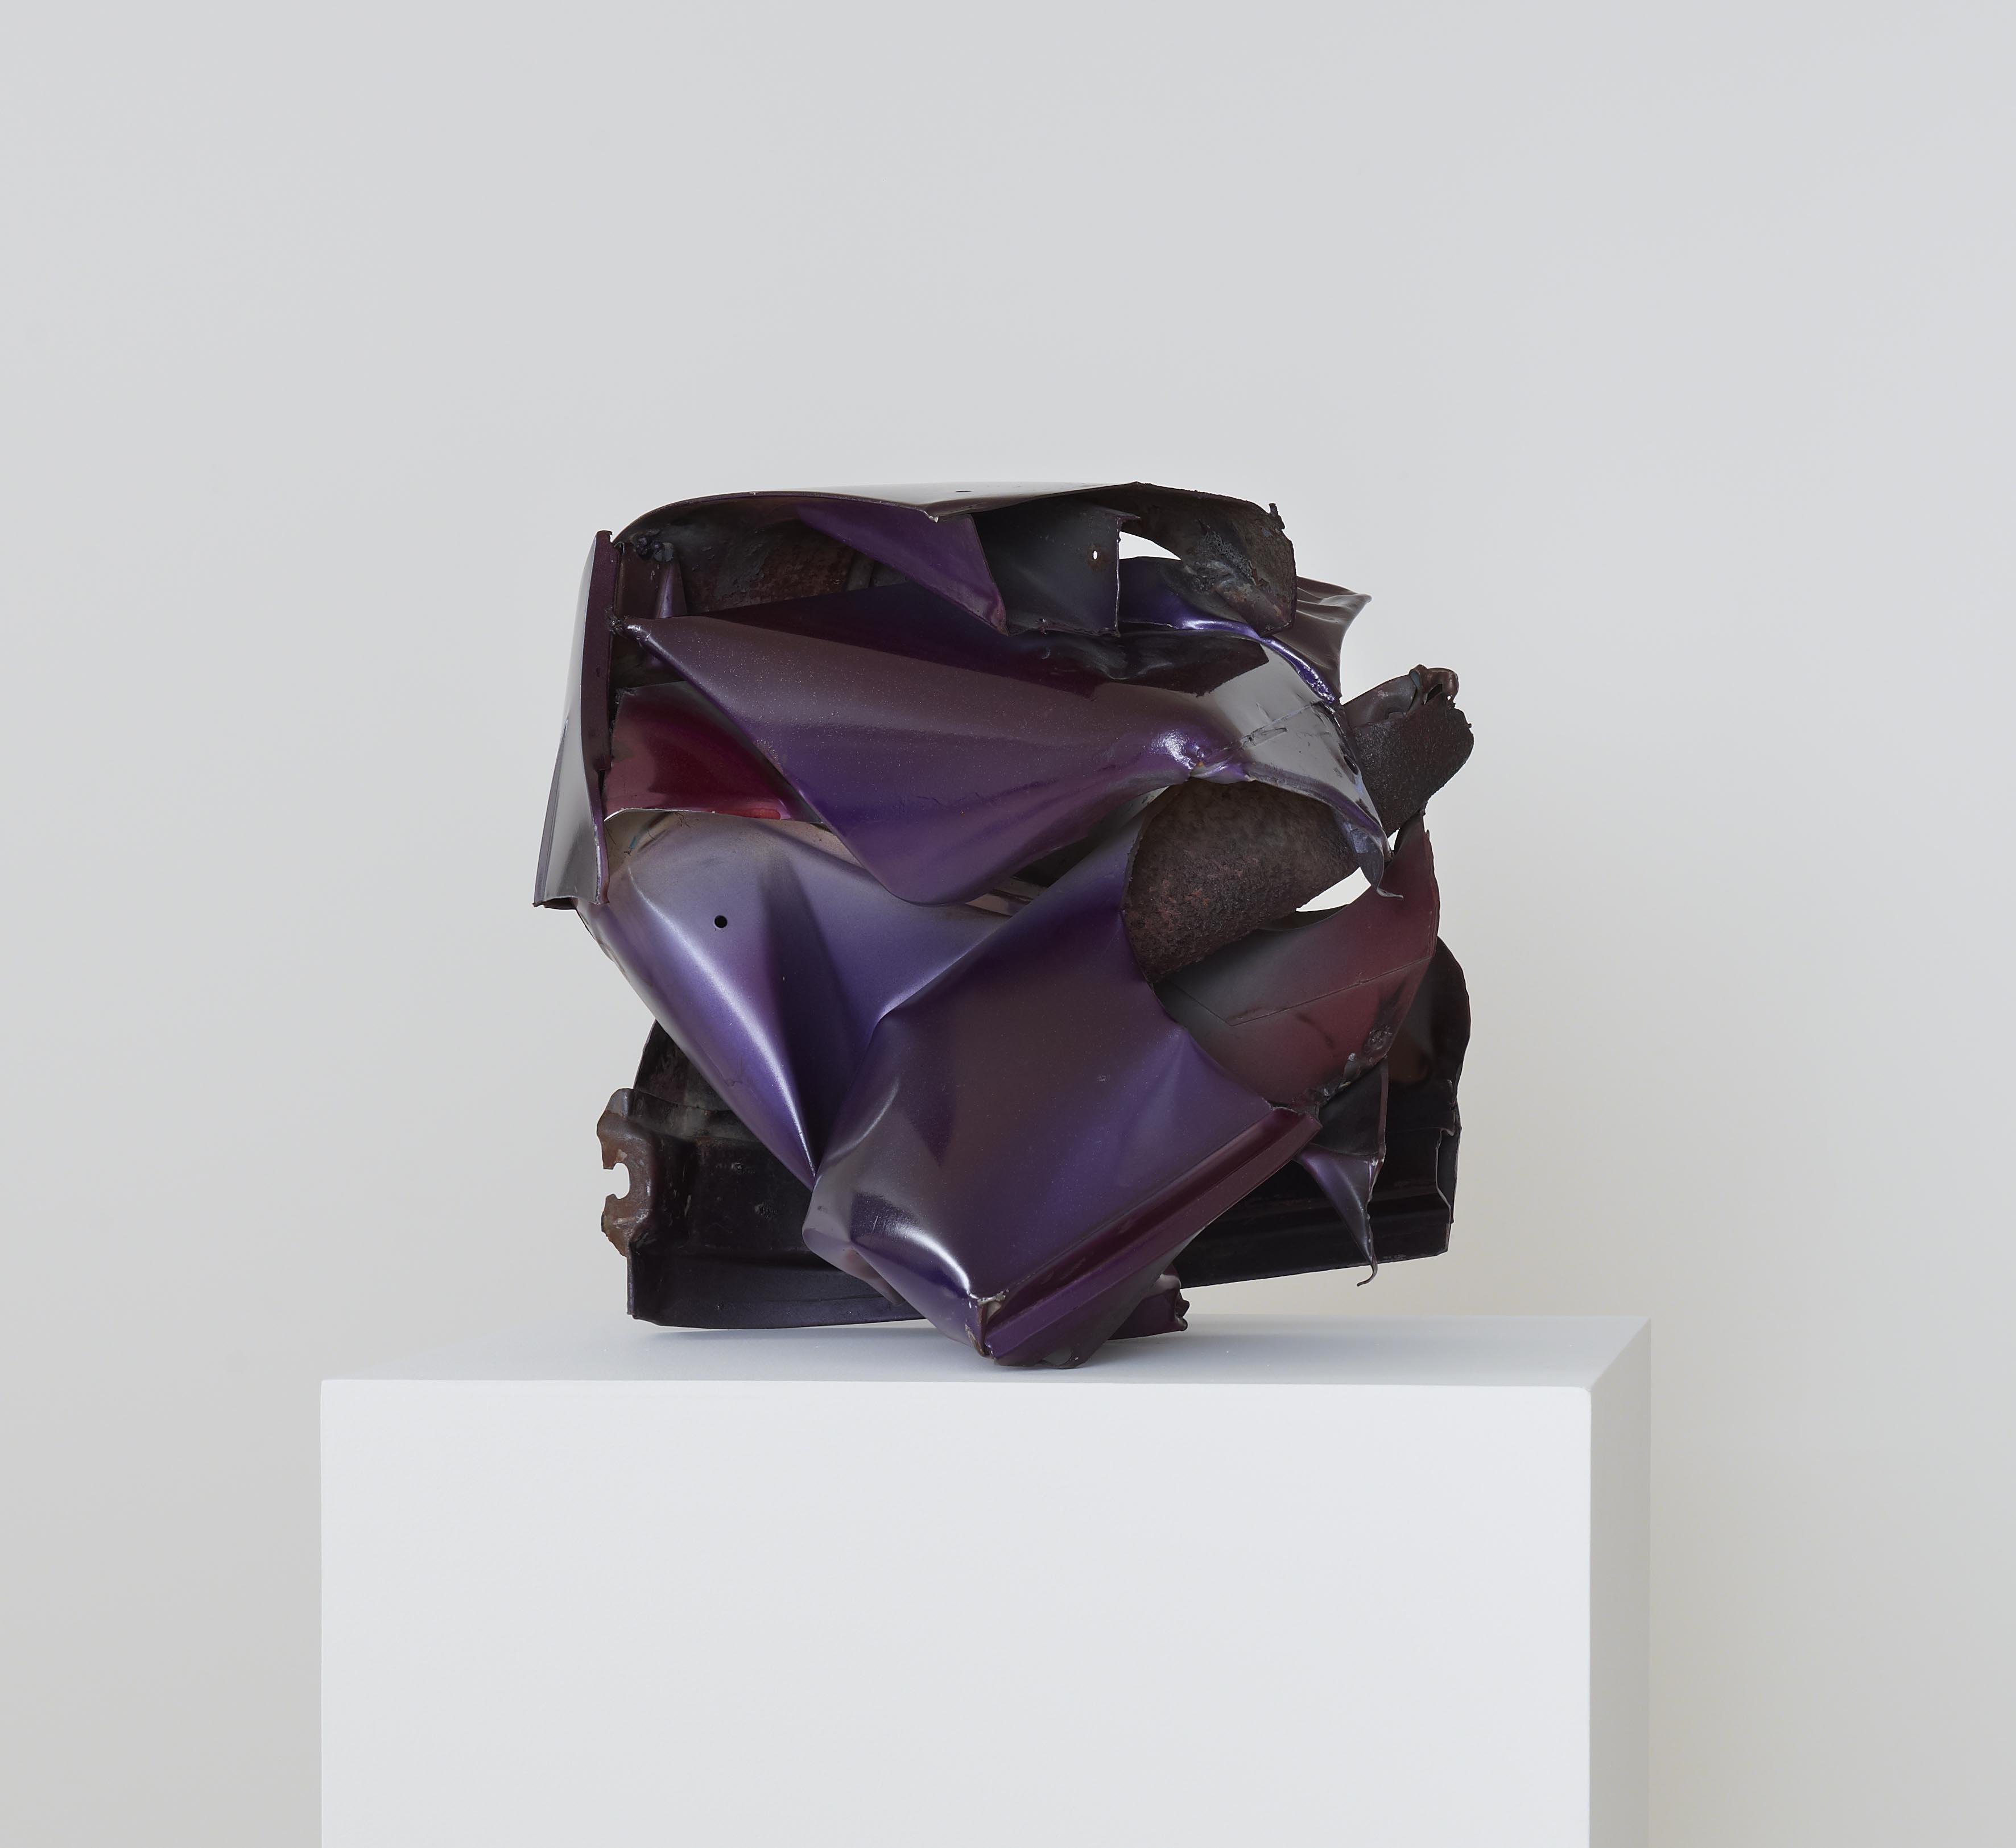 ohn Chamberlain, It Ain't Cheap, 1965. Installation view, the Dan Flavin Art Institute, Bridgehampton, New York. © John Chamberlain/ Artists Rights Society (ARS), New York. Photo Bill Jacobson. Courtesy Dia Art Foundation, New York.